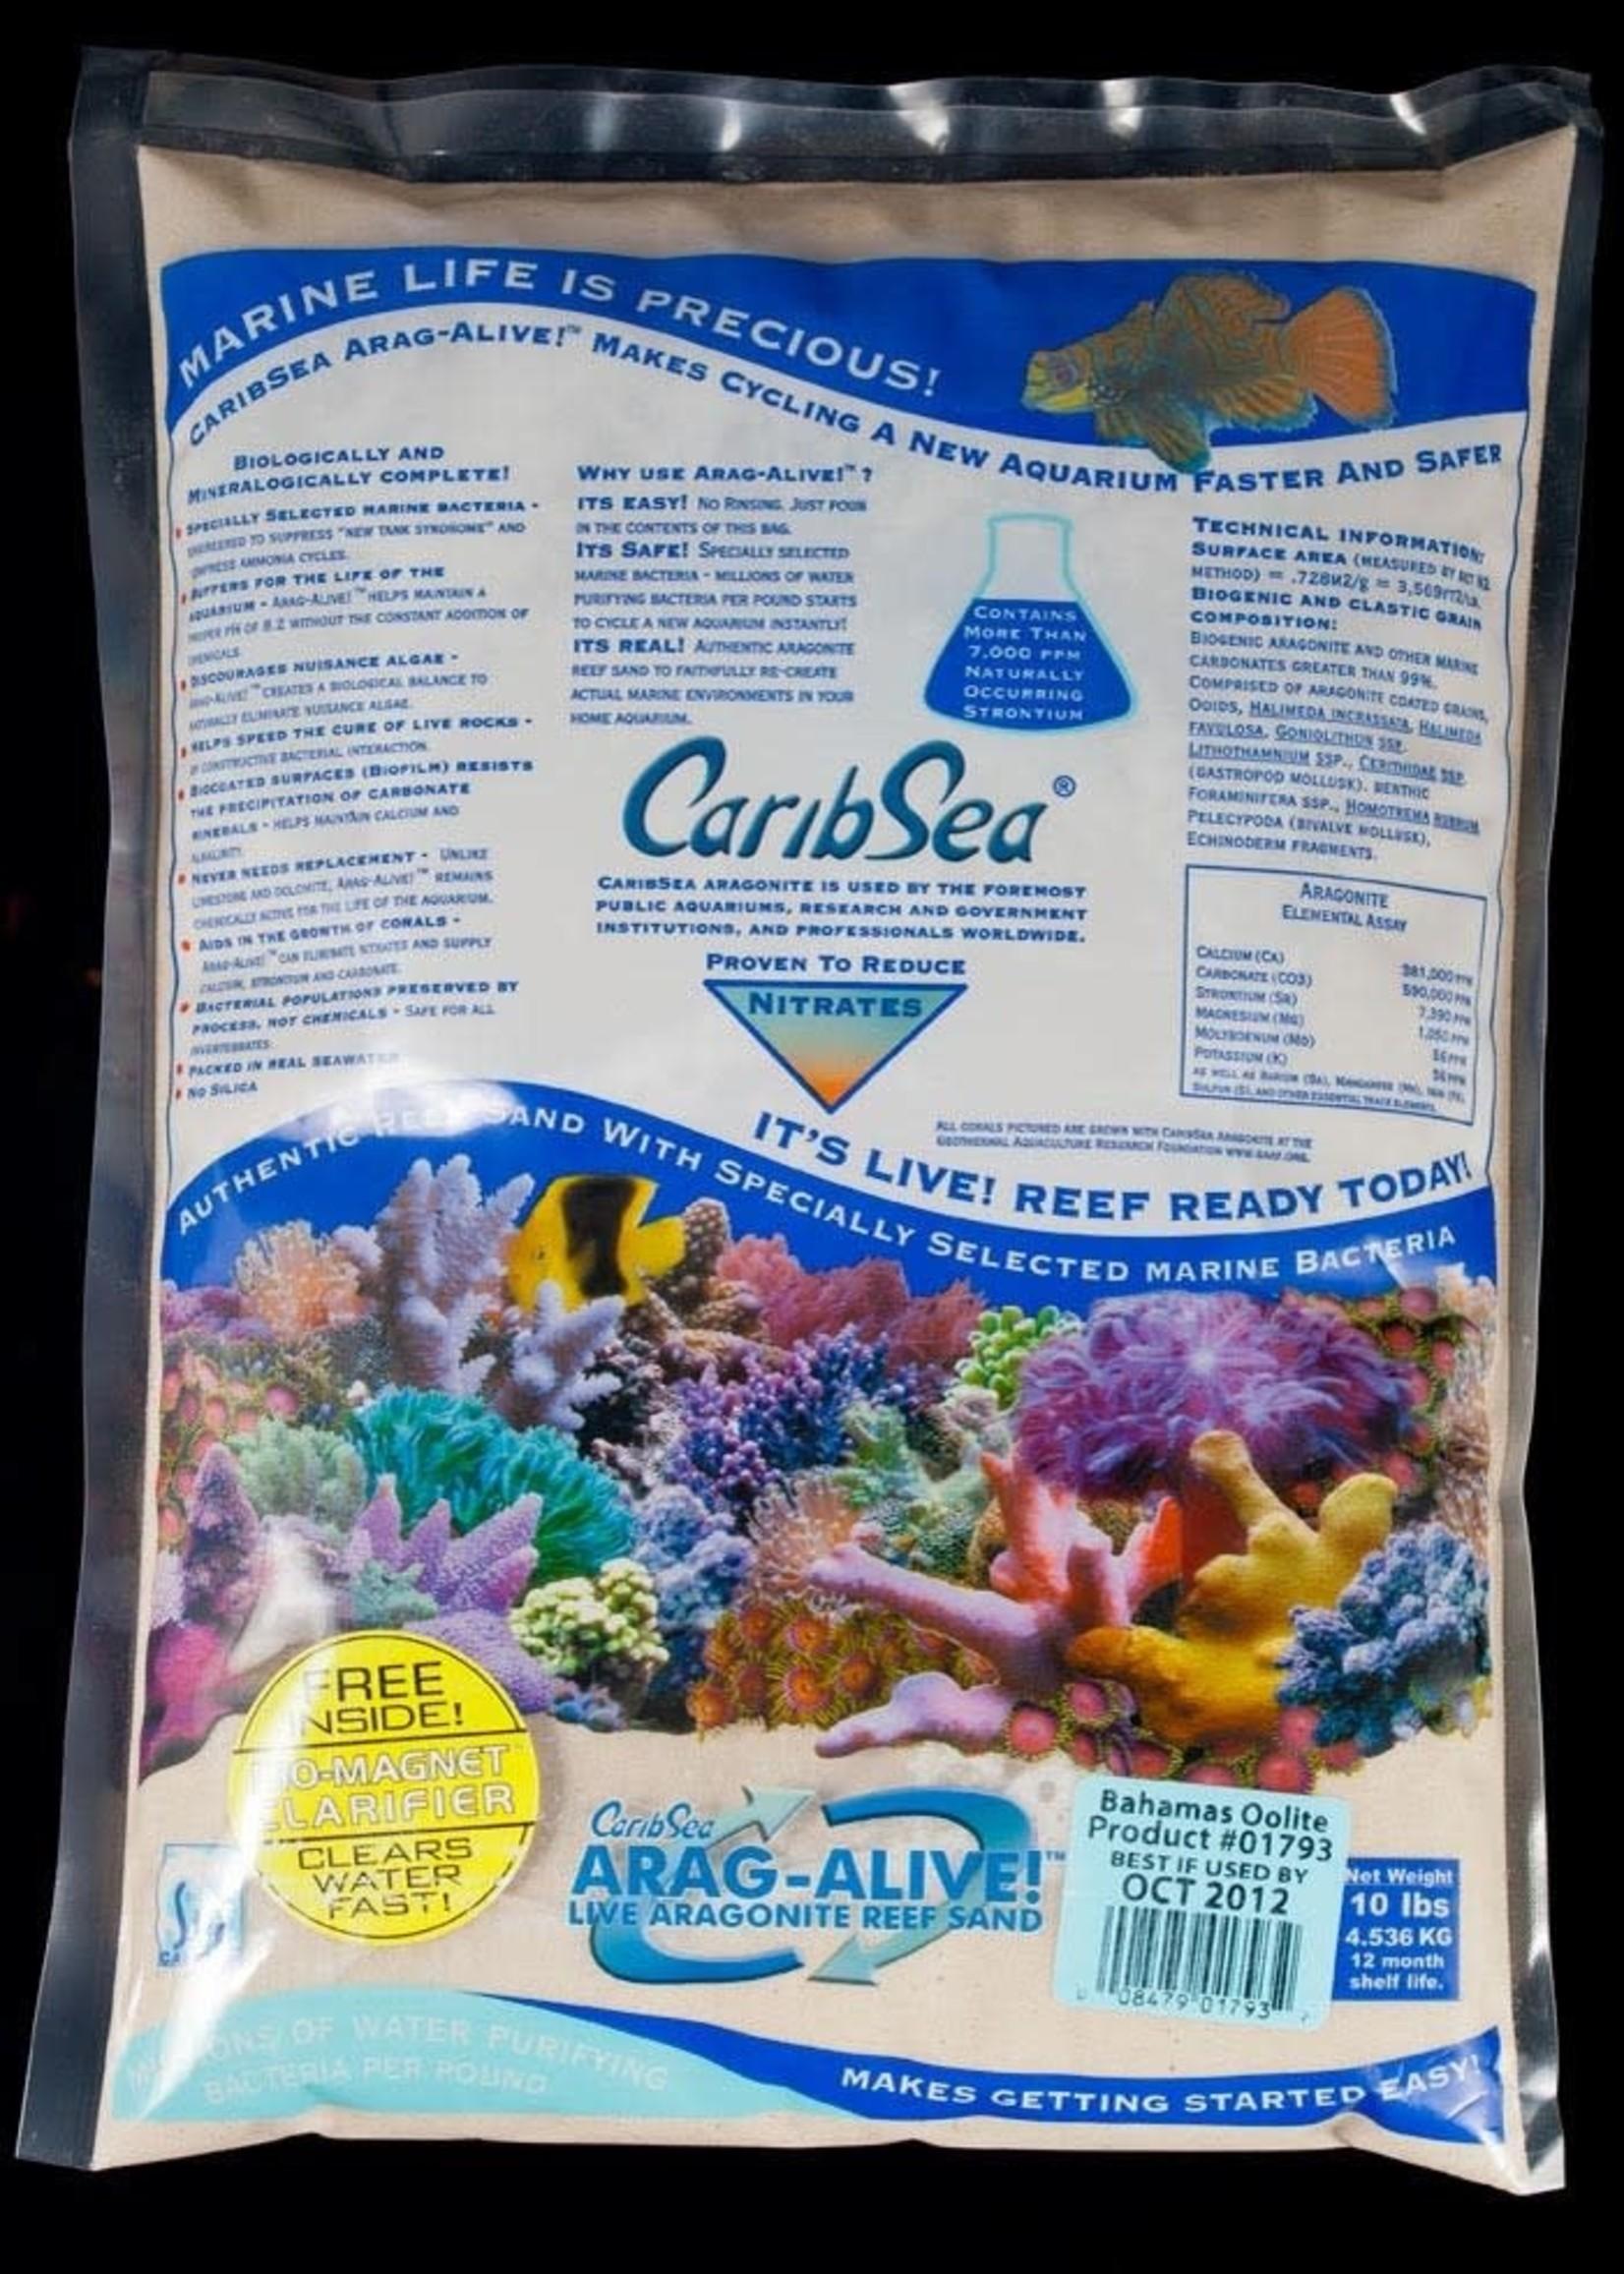 CARIBSEA INC CaribSea Arag-Alive Bahamas Oolite 10lb